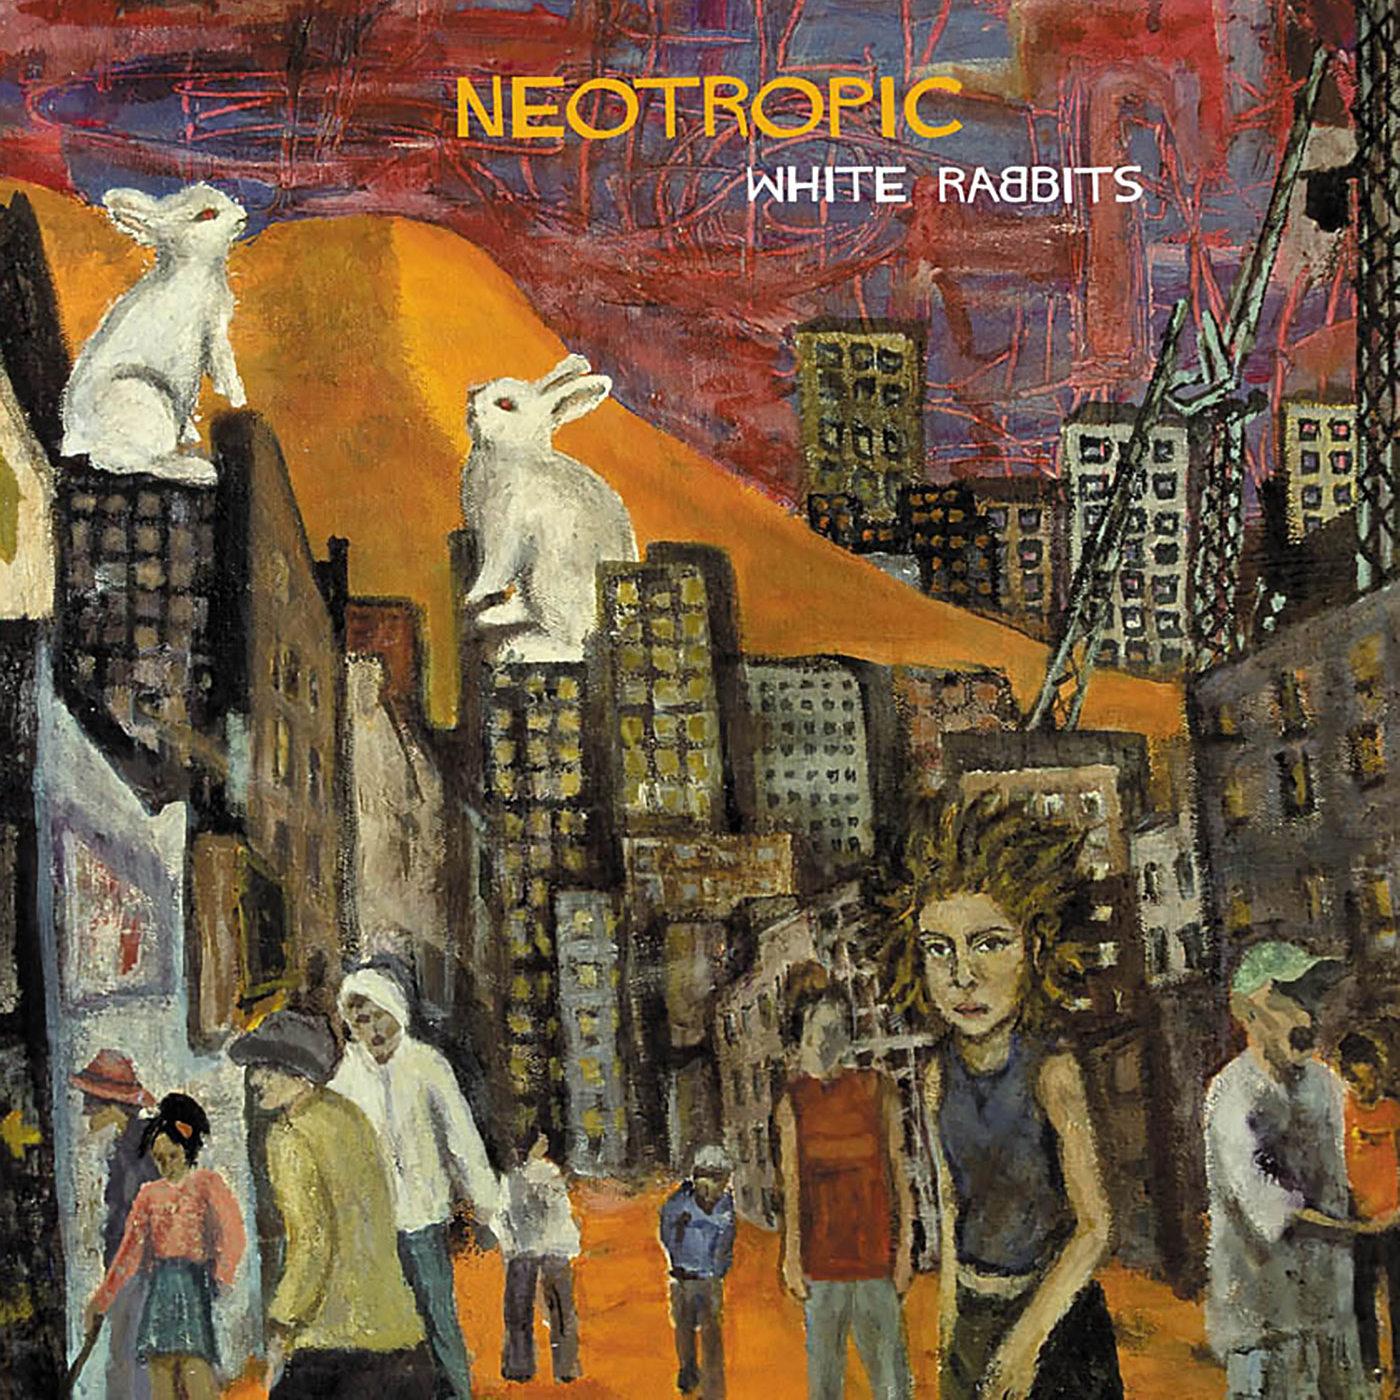 NEOTROPIC_WhiteRabbits_cover_PinkLizardMusic-1400-webopt-83